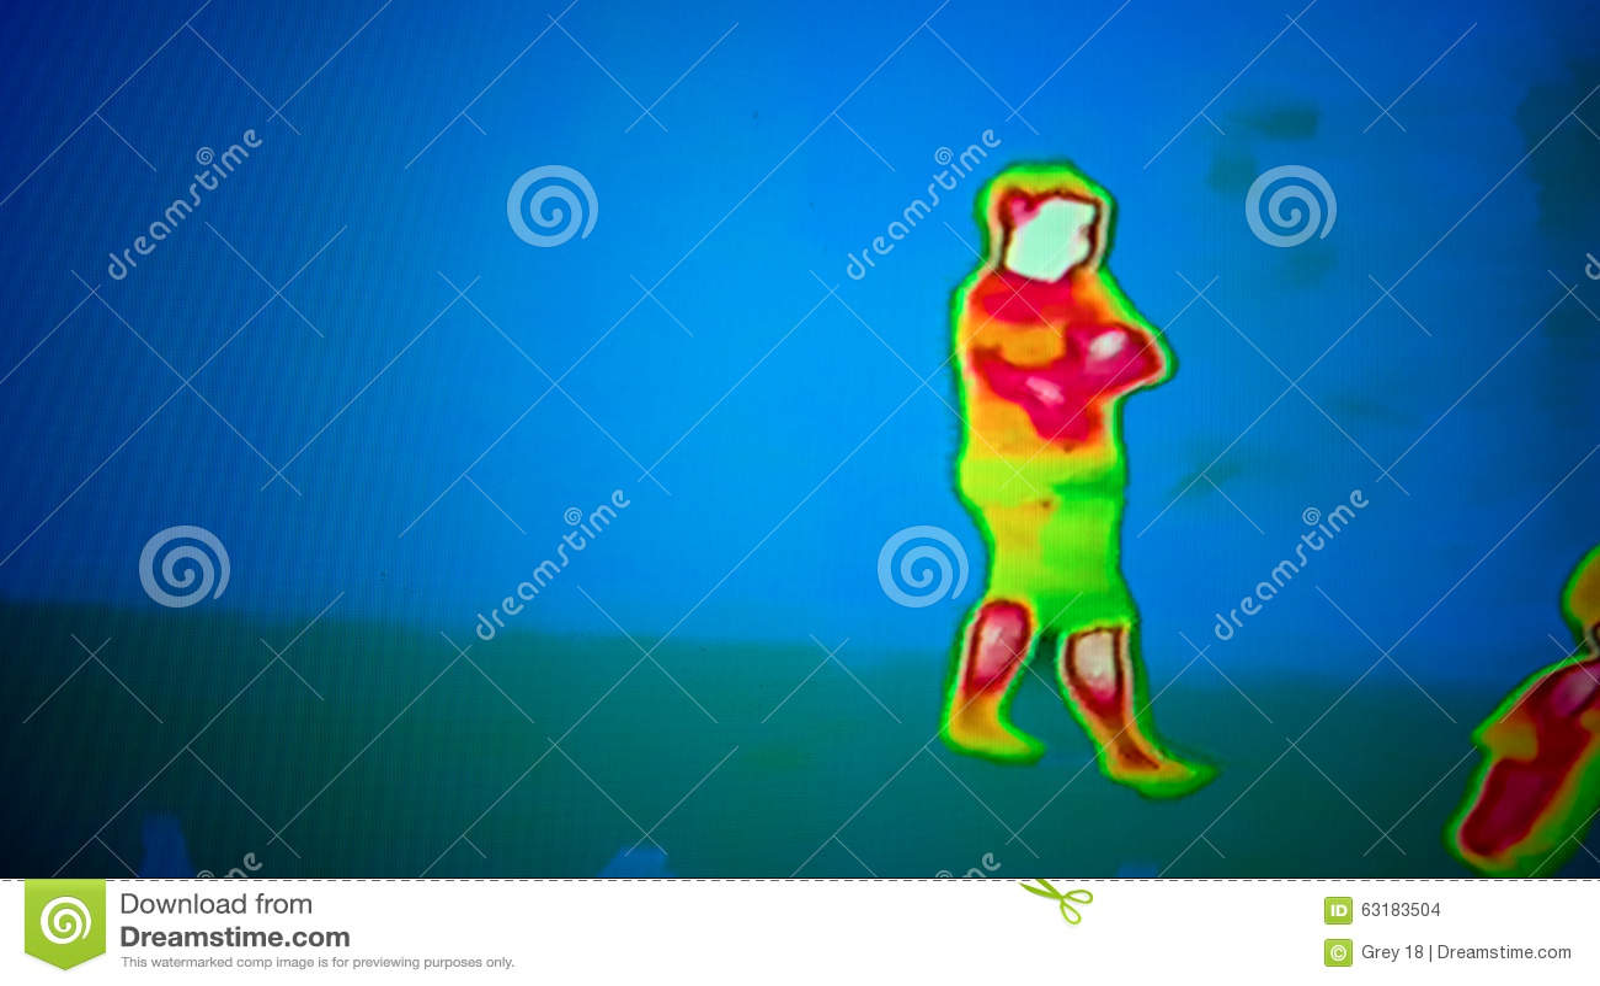 Thermal Image Stock Photo Image 63183504